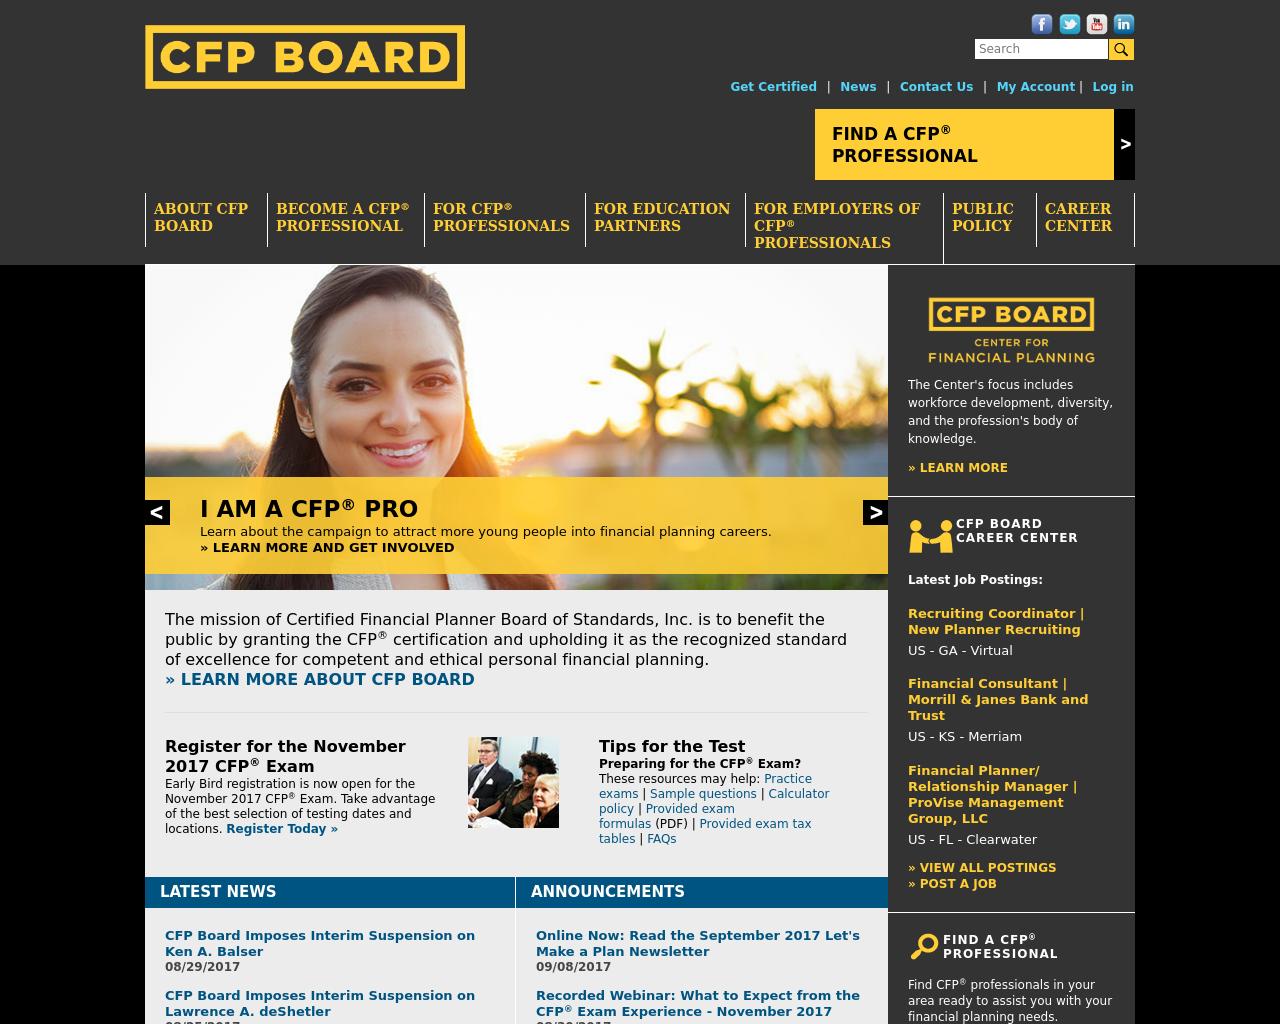 CFP-BOARD-Advertising-Reviews-Pricing